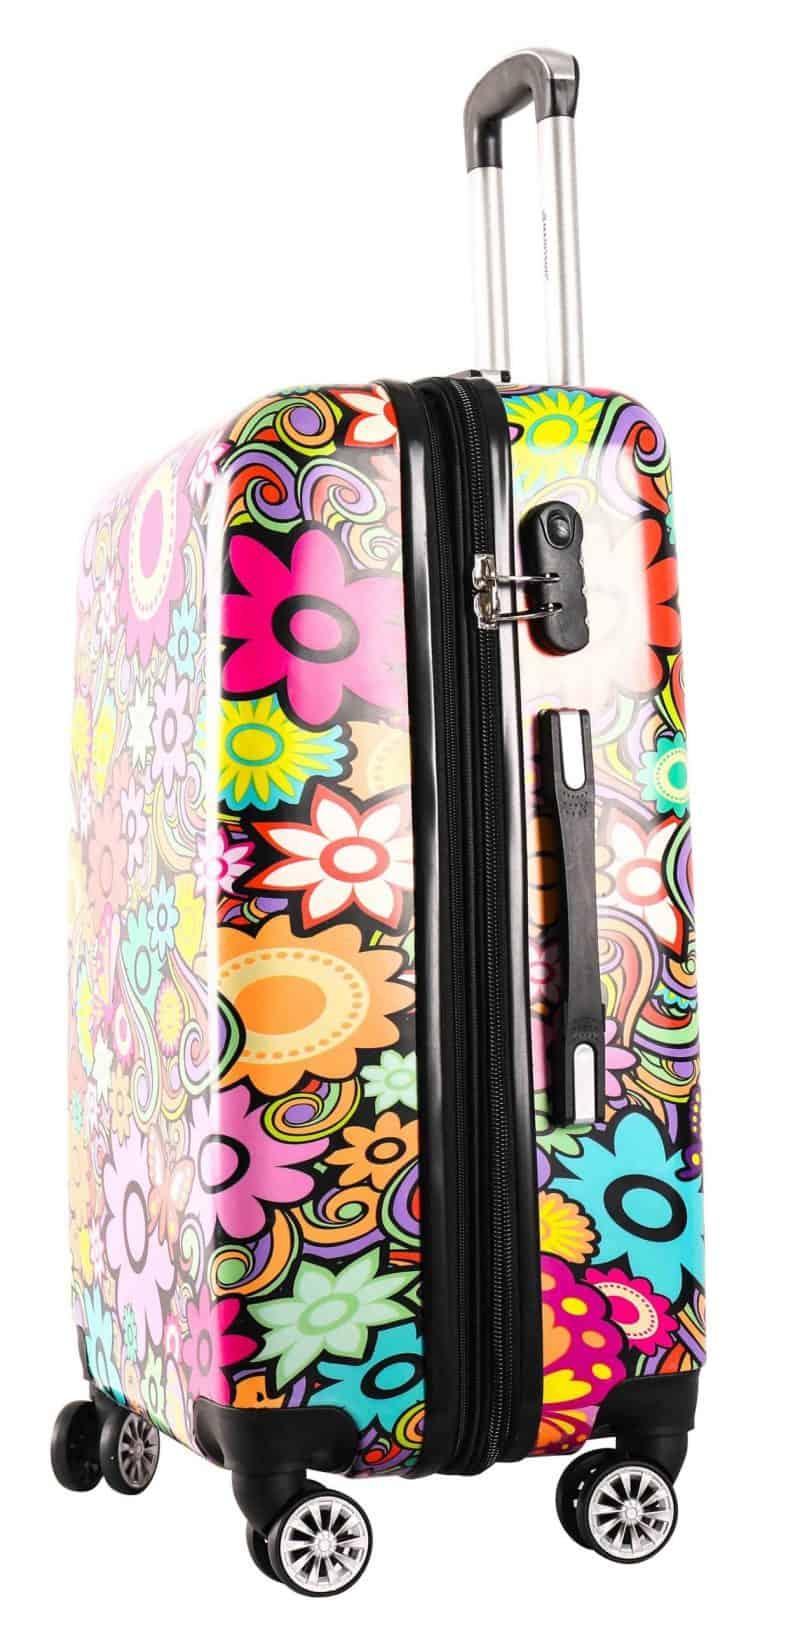 valise rigide 70 cm Madisson pas cher fleurs